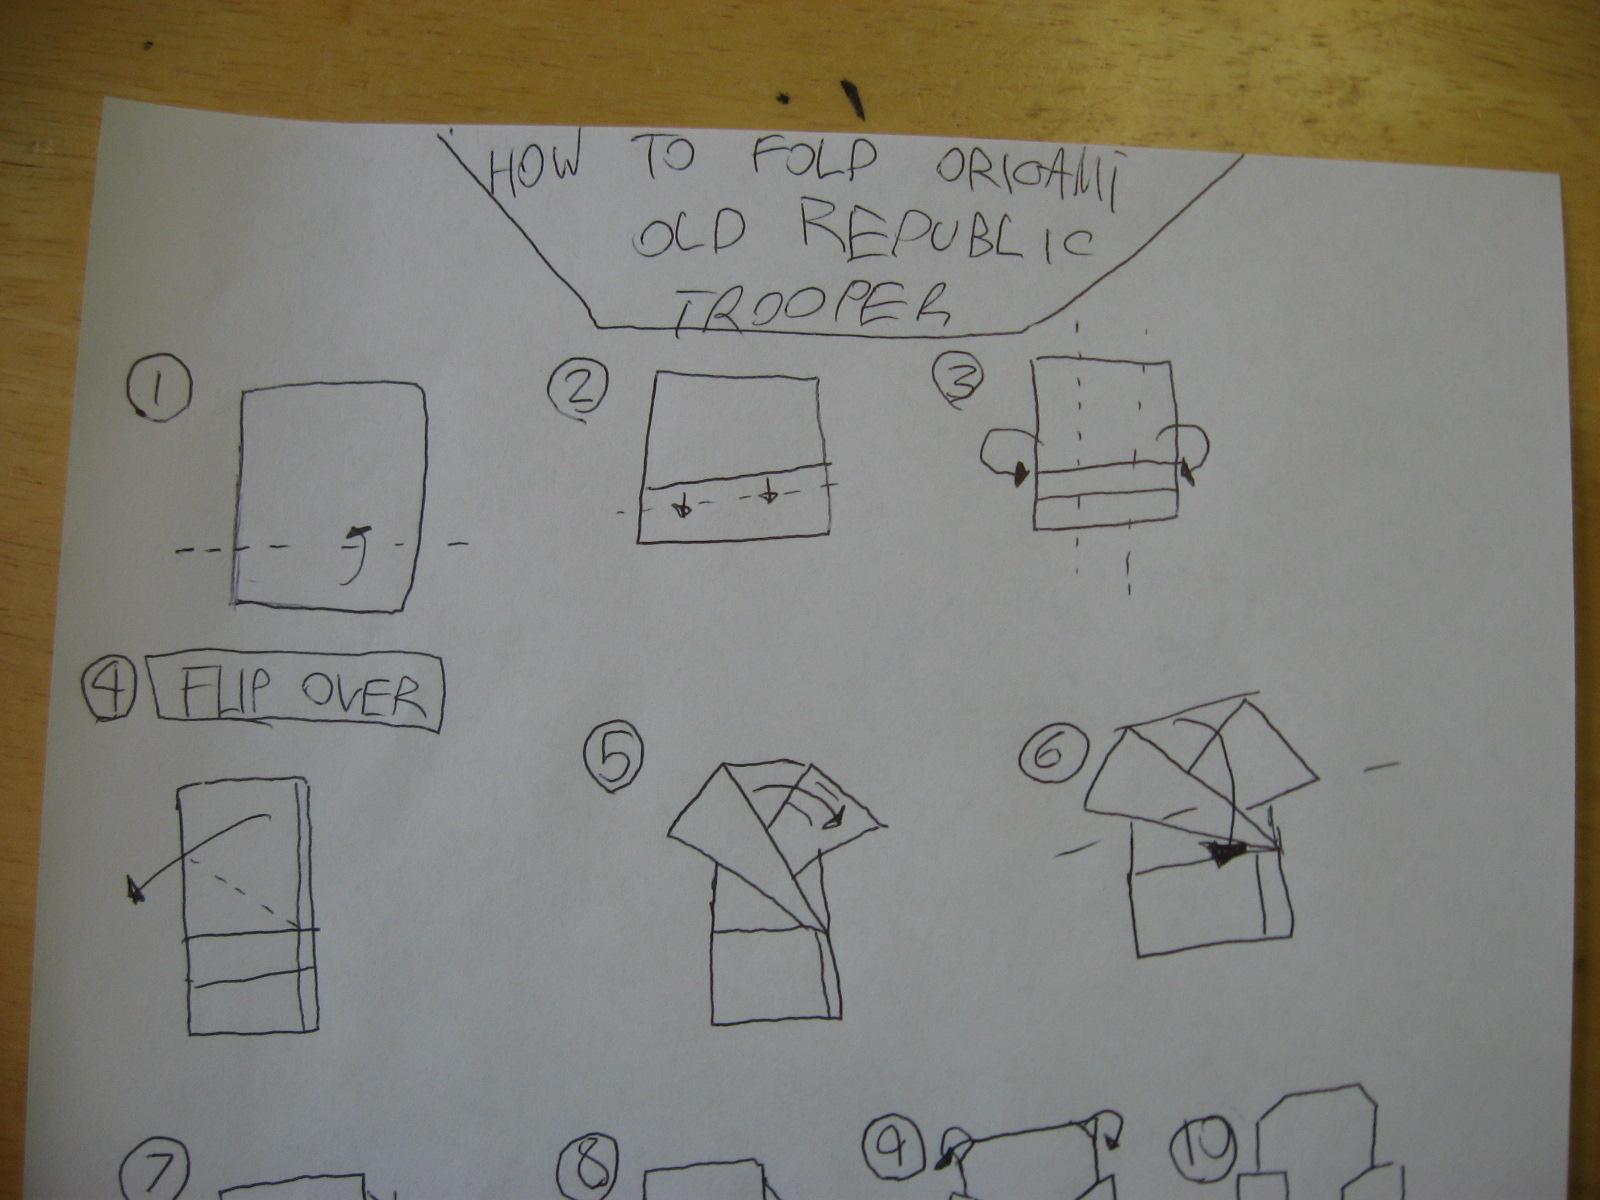 SuperFolder Gavin's Cover Yoda! With instrux!!, | OrigamiYoda - photo#31